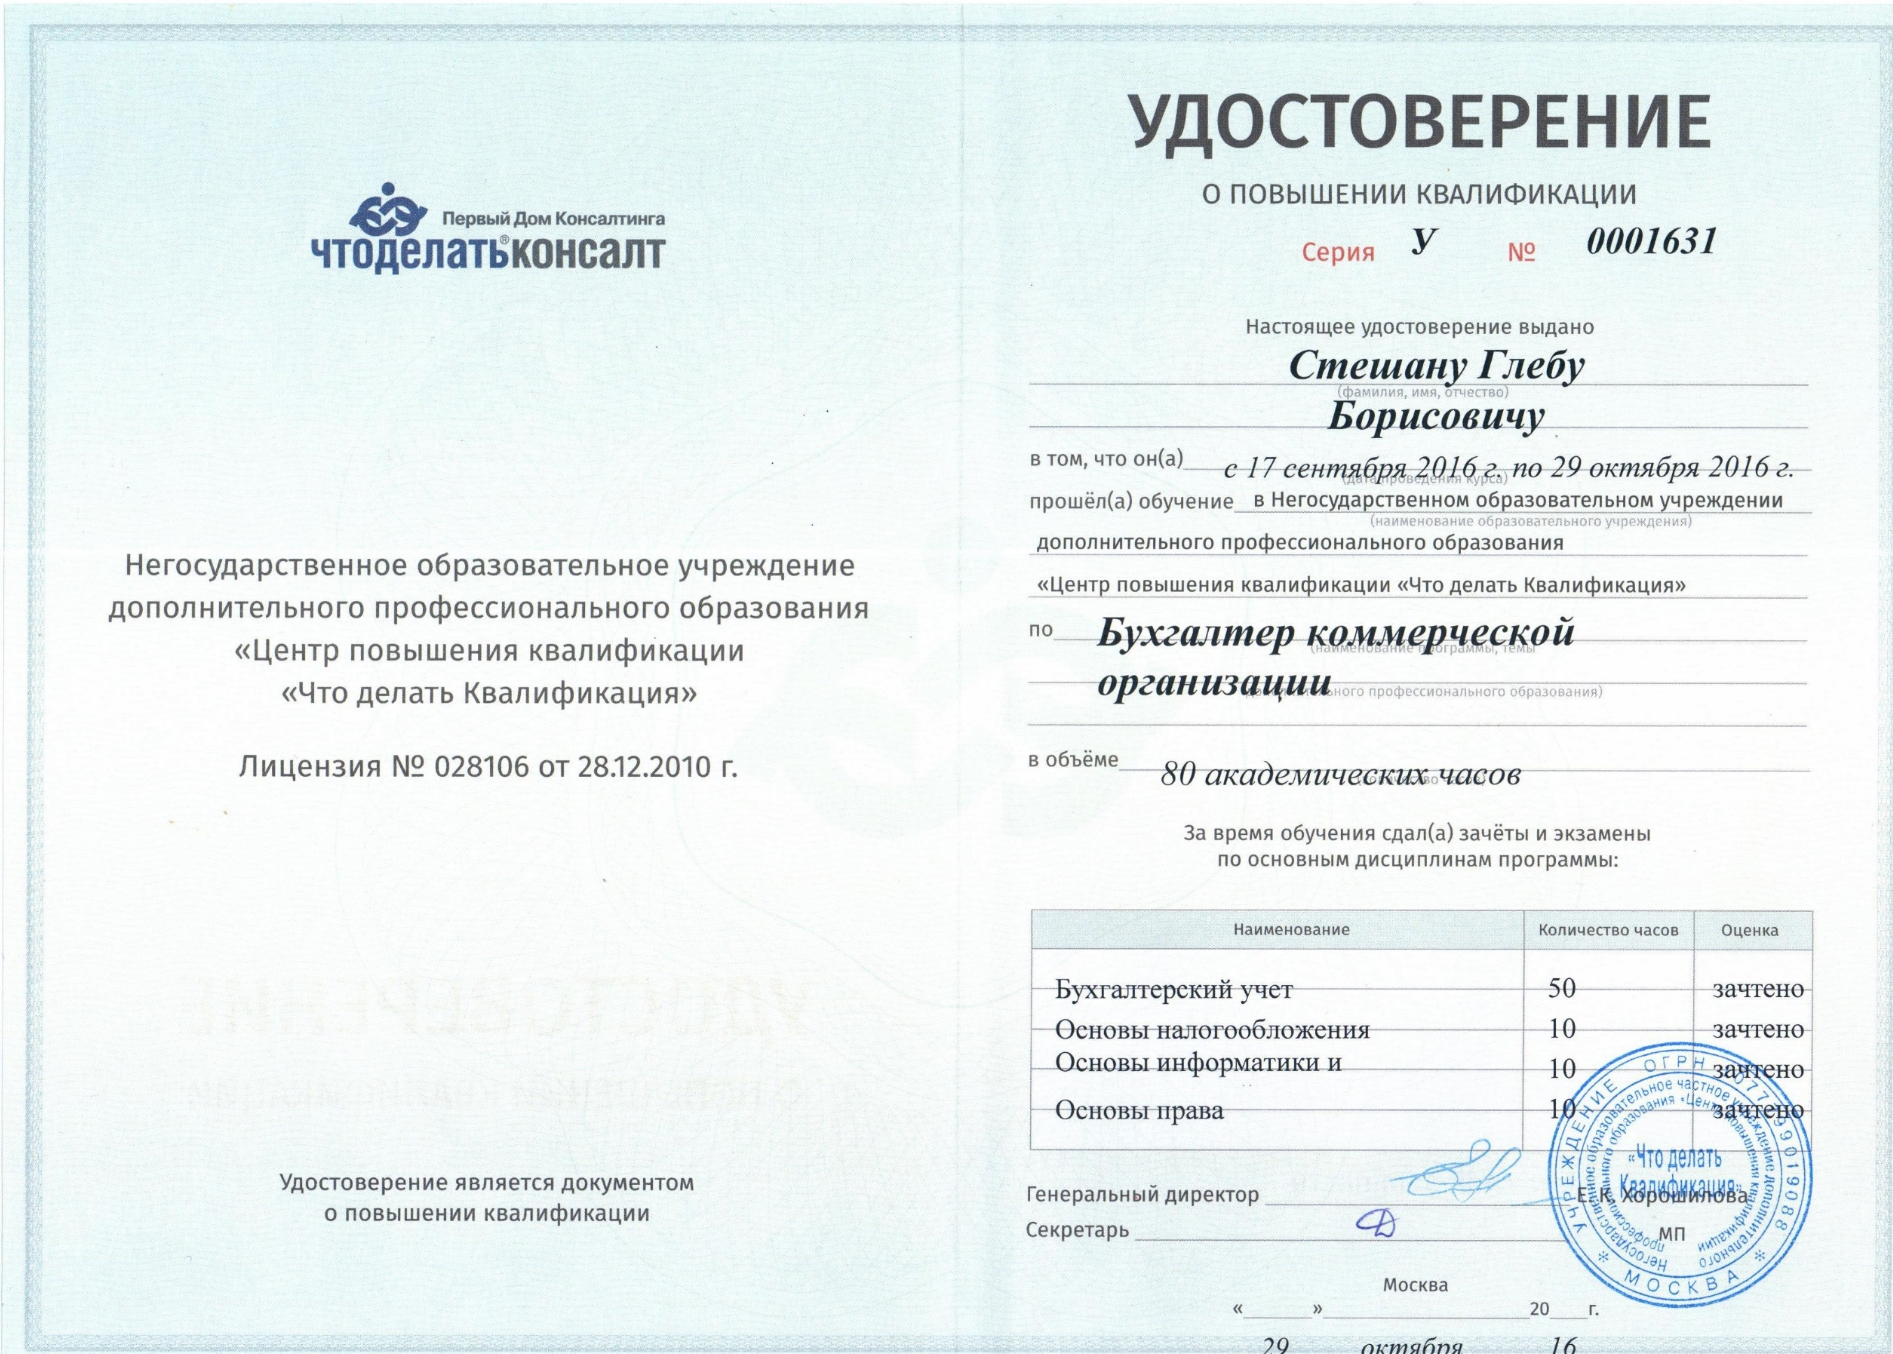 http://www.konsaltingpremium.ru/wp-content/uploads/2018/02/Udostoverenie-o-povyshenii-kvalifikacii.jpg